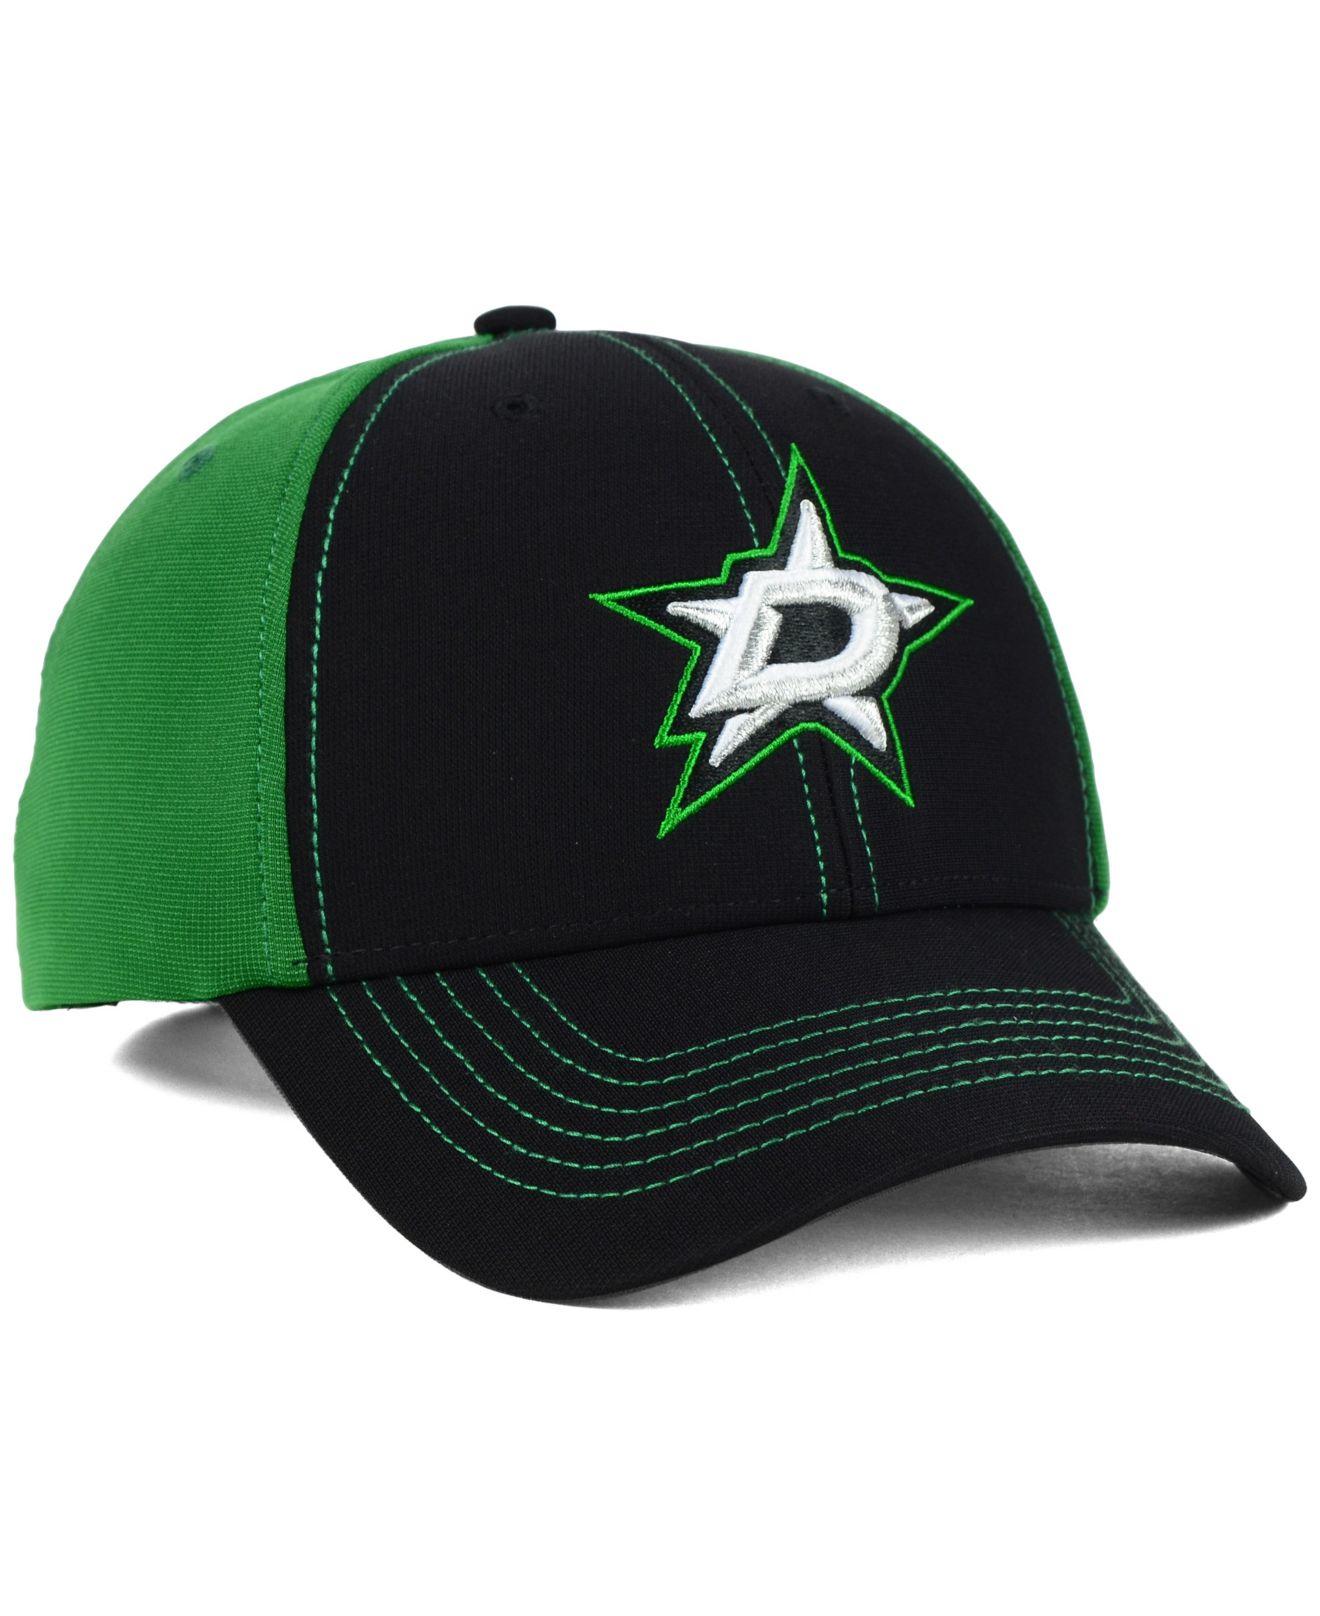 promo code 658c0 b68a6 Lyst - 47 Brand Dallas Stars Overturn Mvp Cap in Green for Men